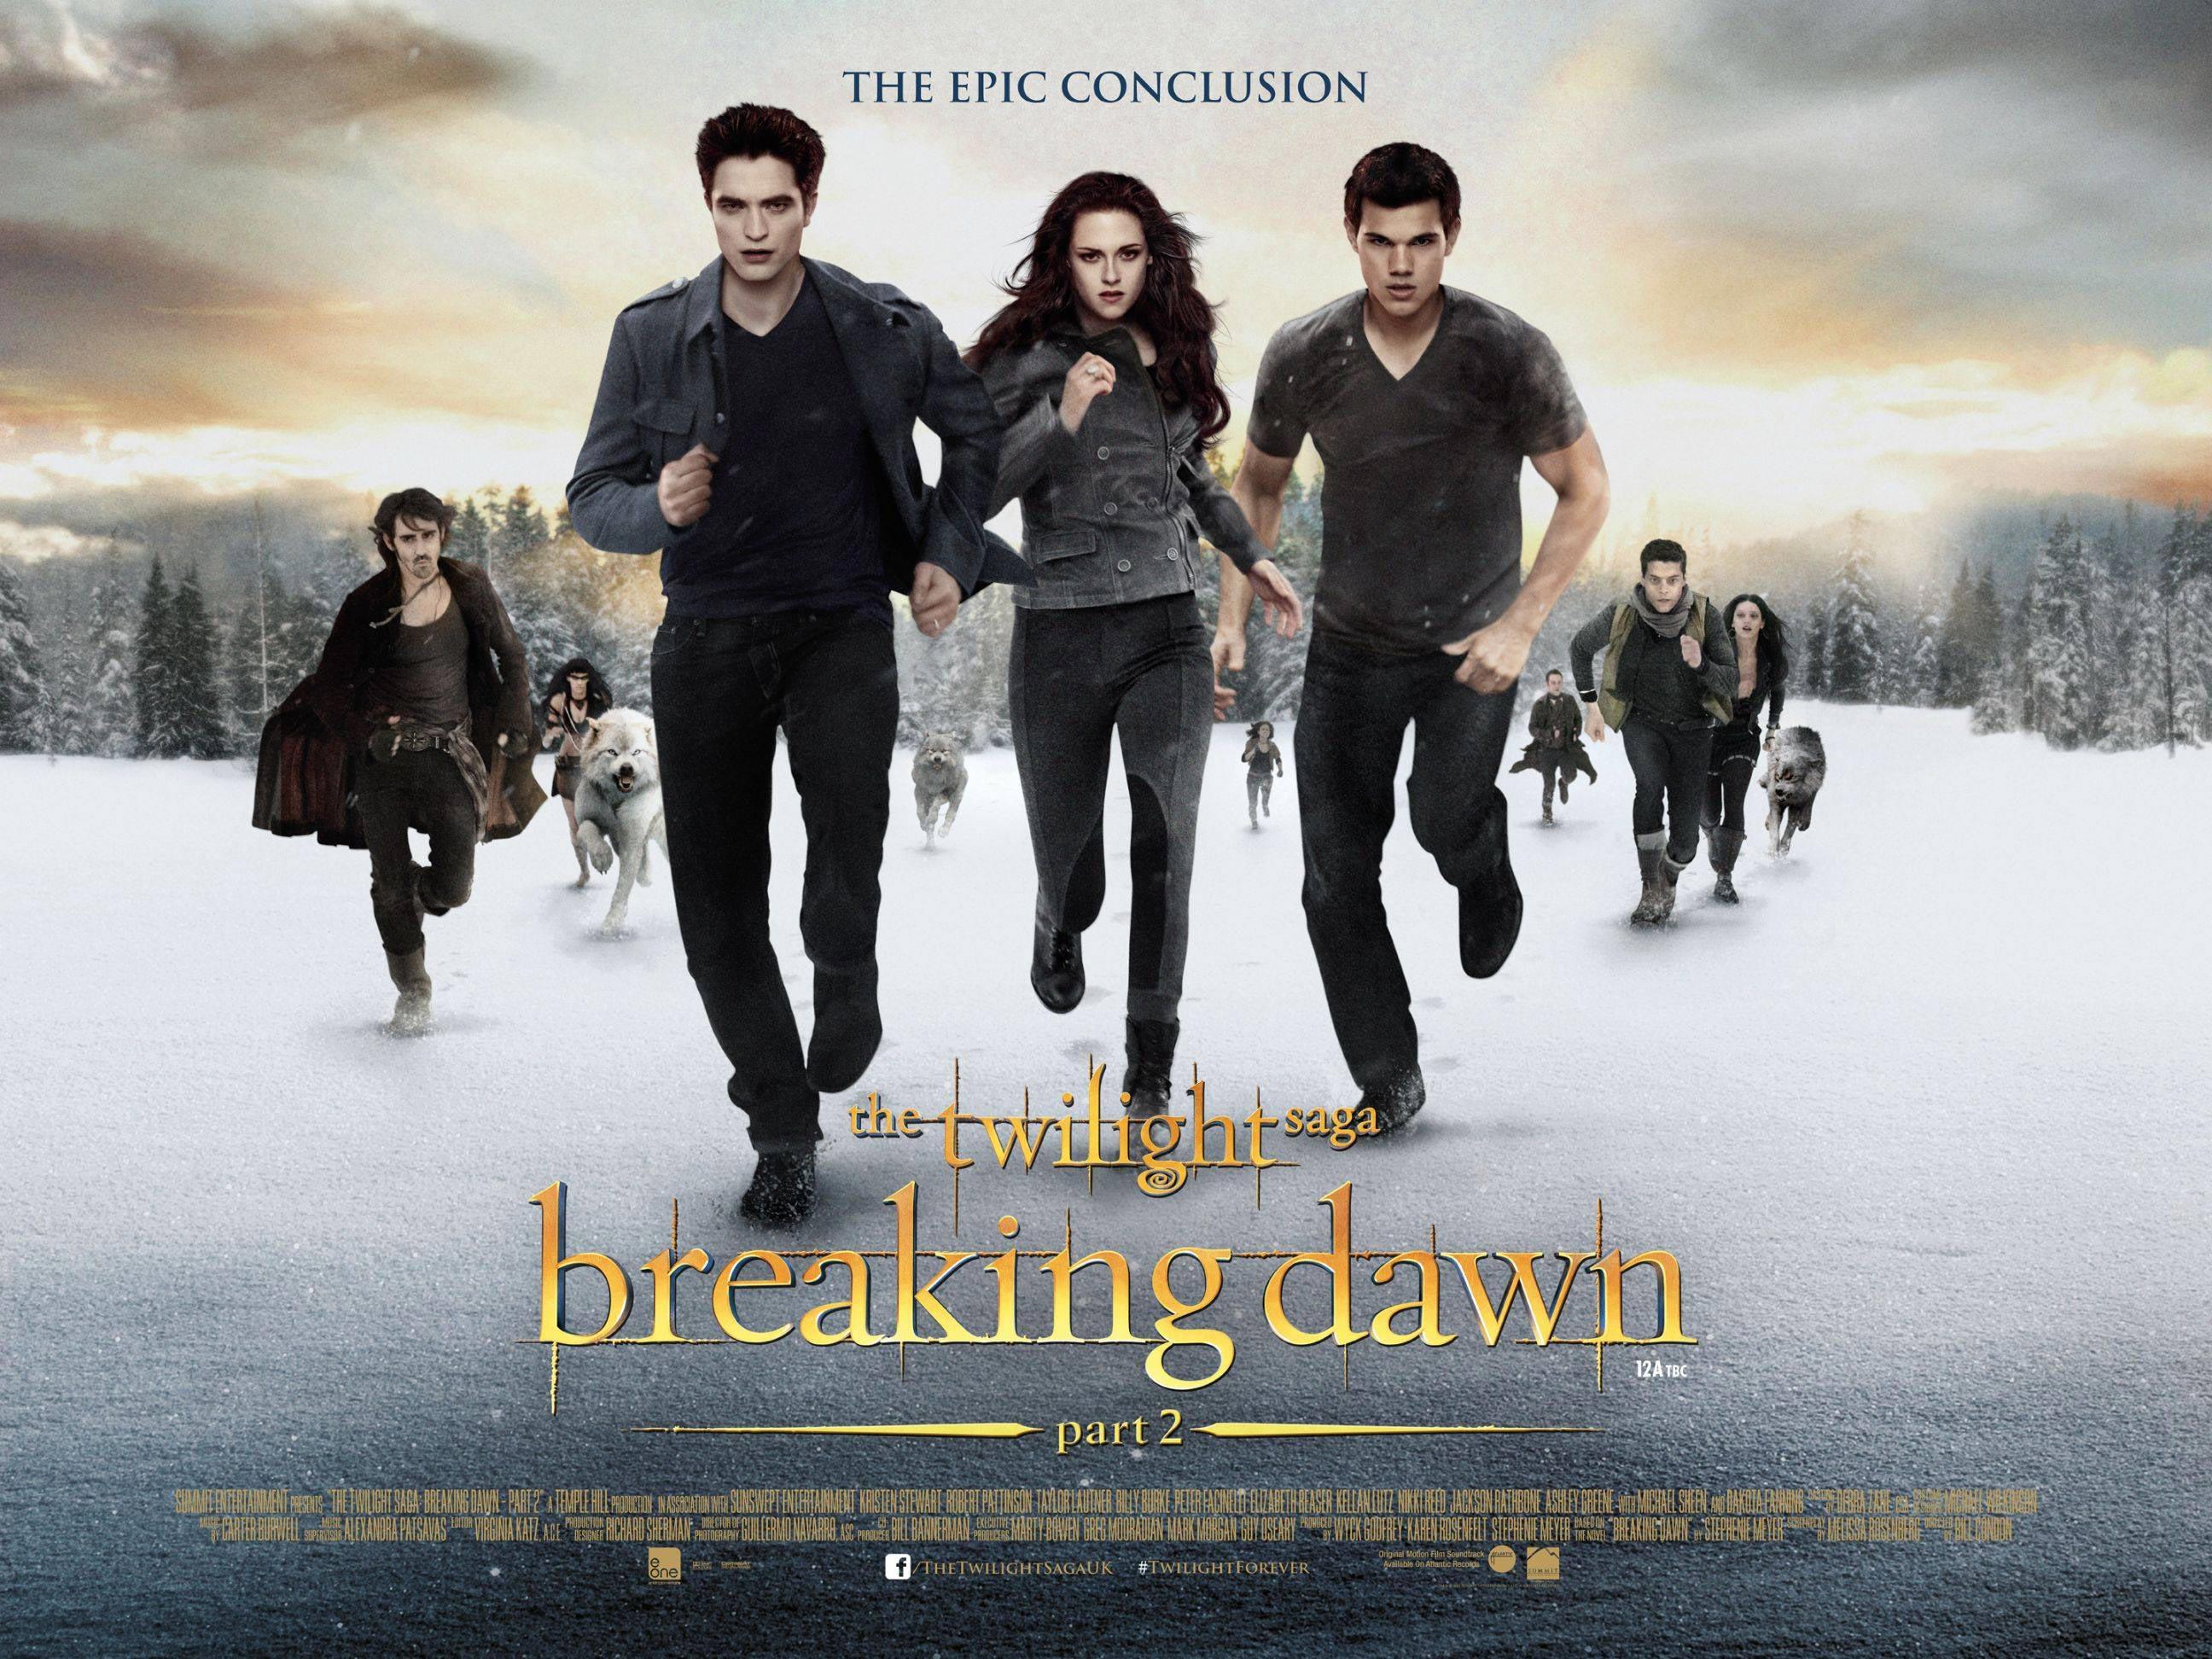 http://www.filmofilia.com/wp-content/uploads/2012/11/Twilight-Breaking-Dawn-Part-2_011.jpg